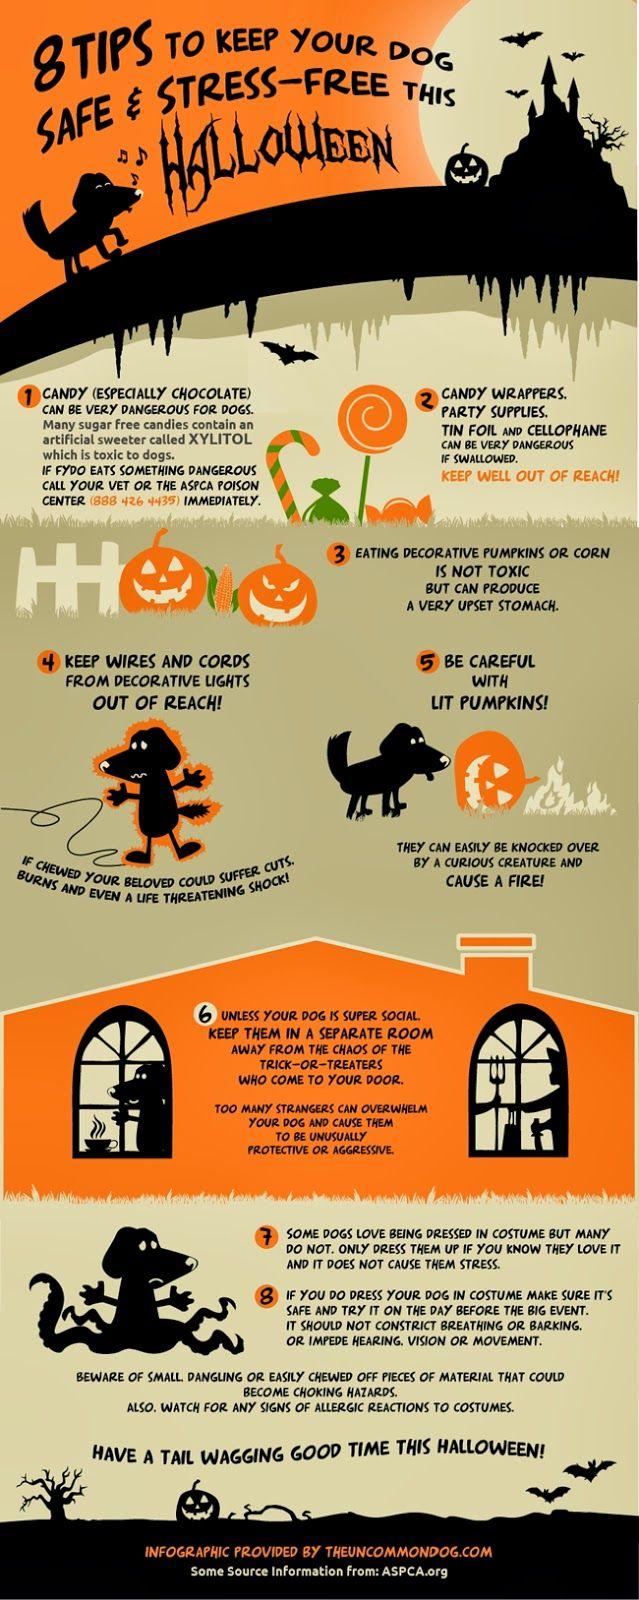 Best 25+ Dog halloween ideas on Pinterest | Dog halloween costumes ...